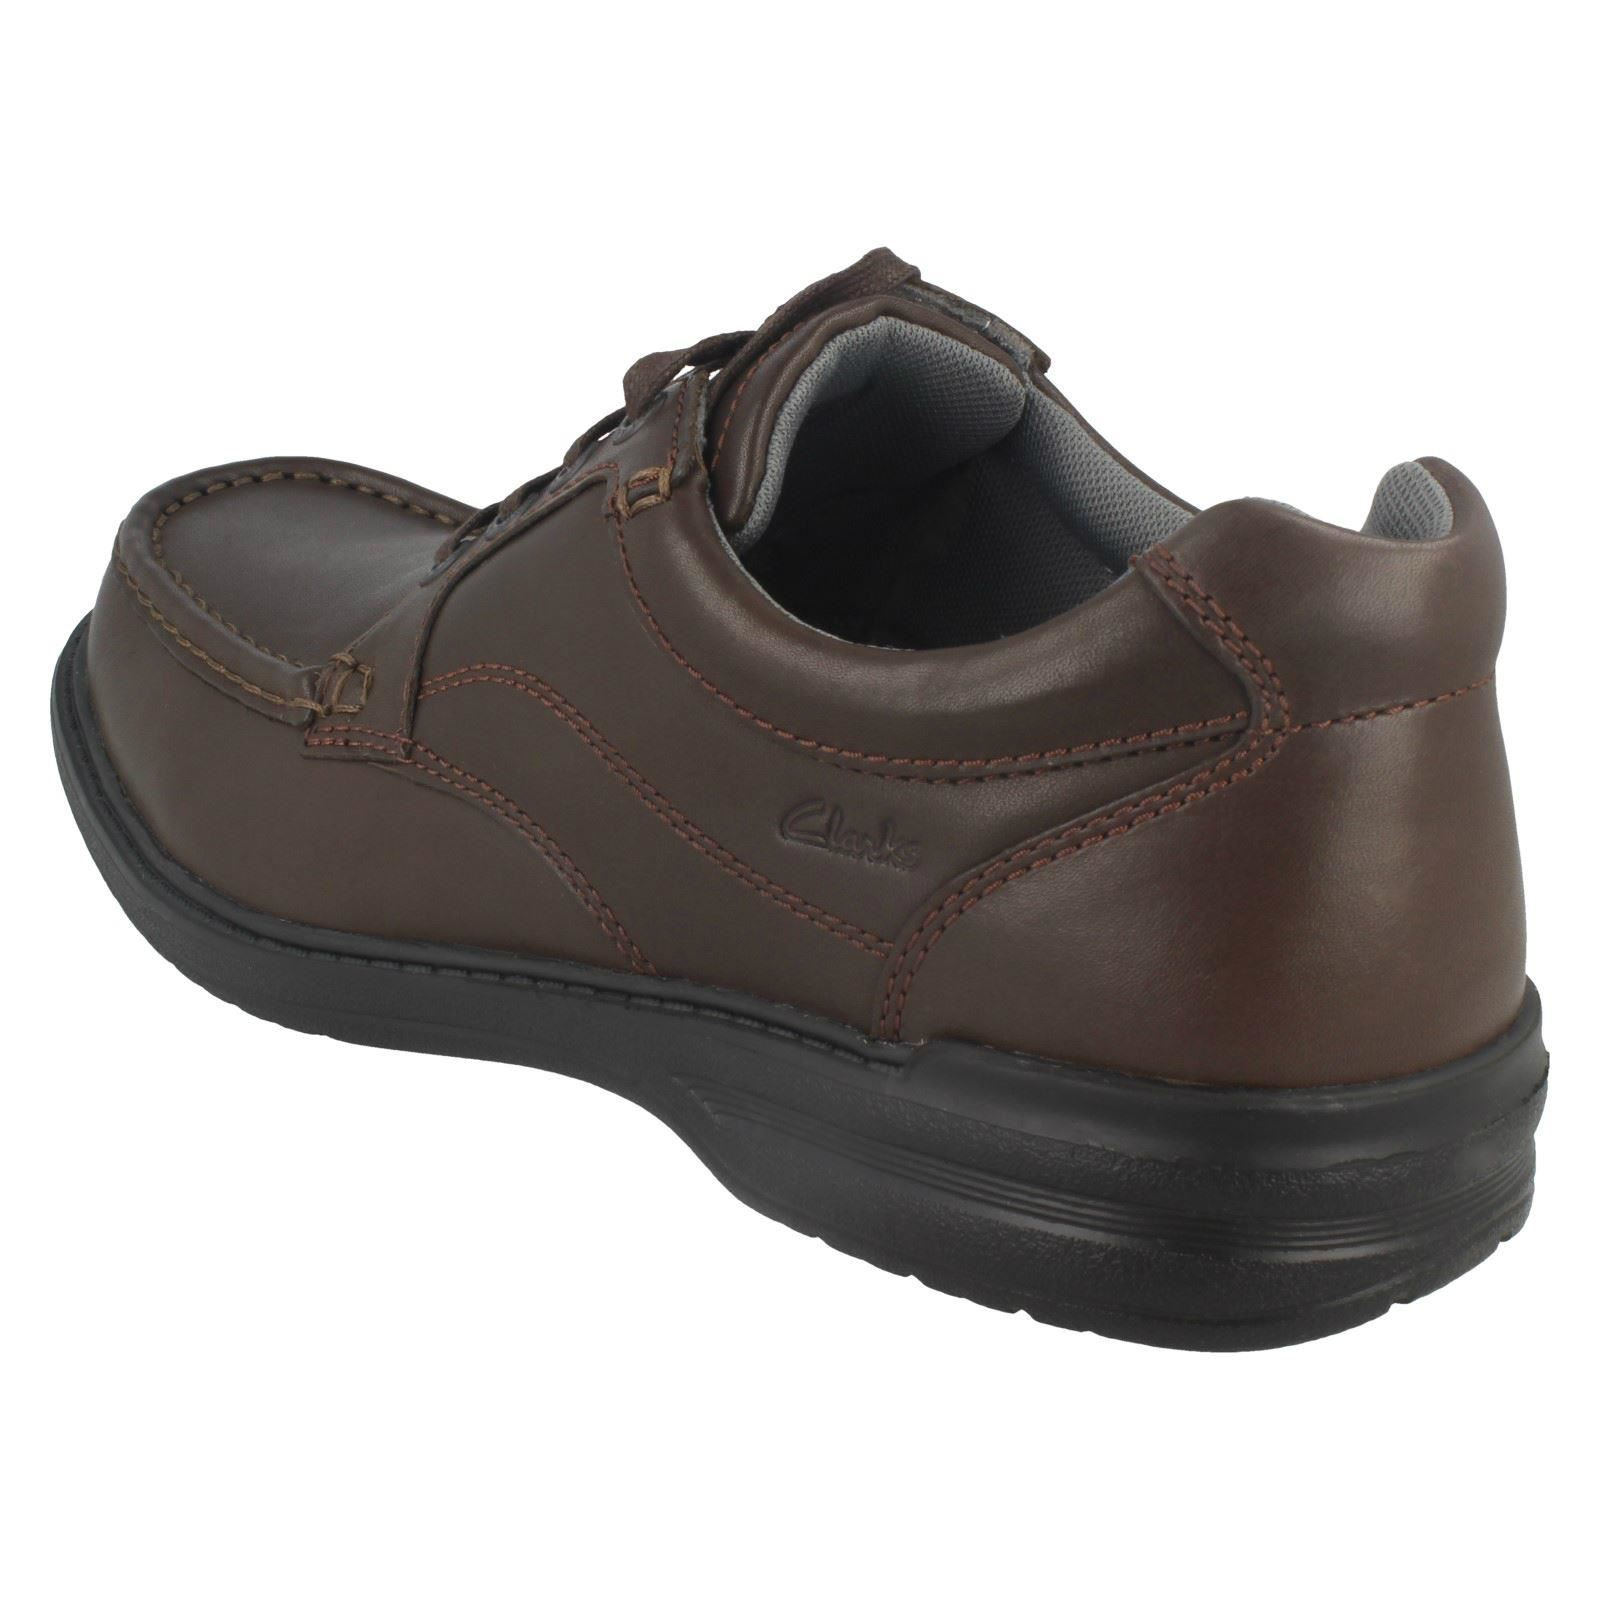 'Mens Clarks' Casual Shoes Keeler Walk